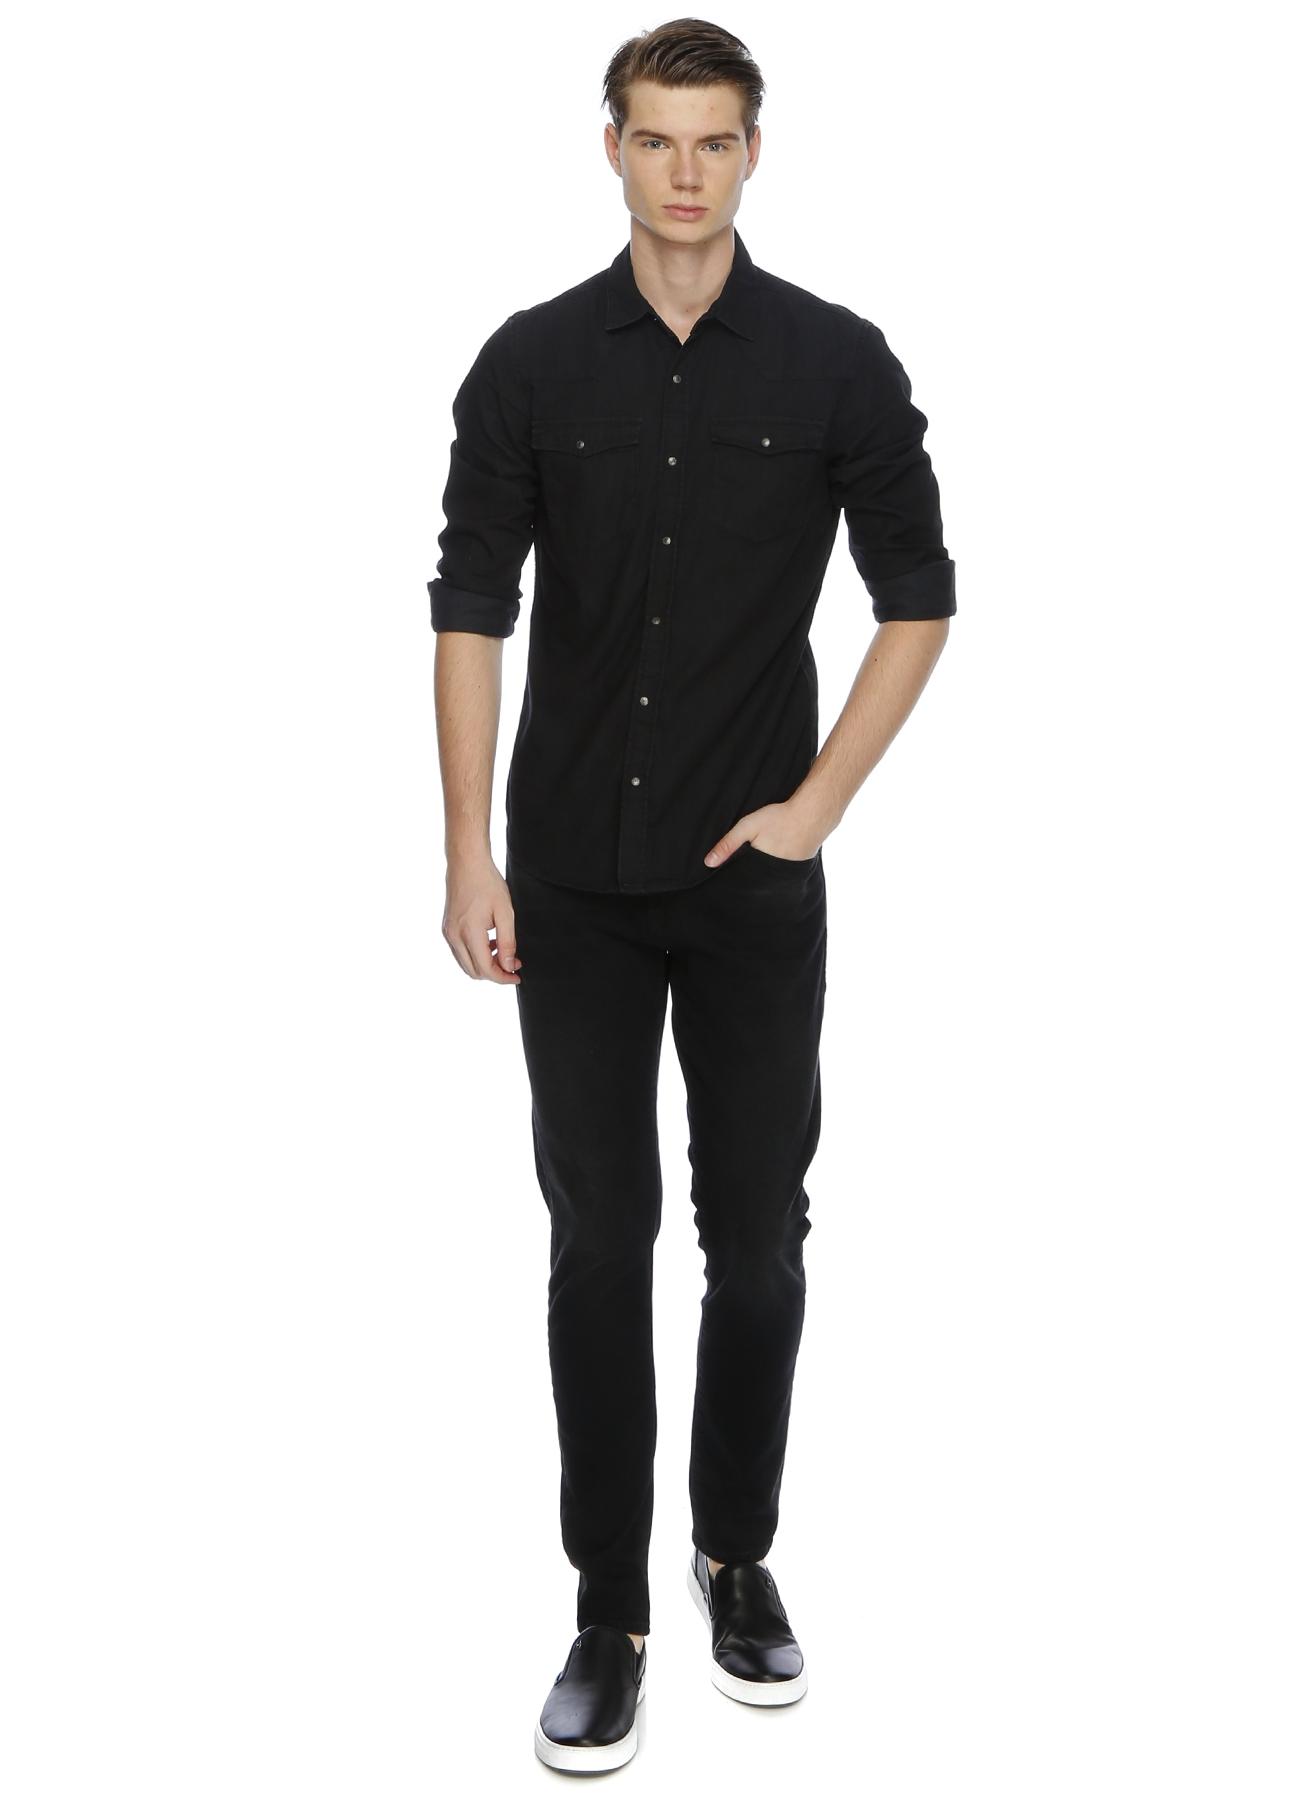 Mavi Klasik Pantolon 31-32 5001817669023 Ürün Resmi